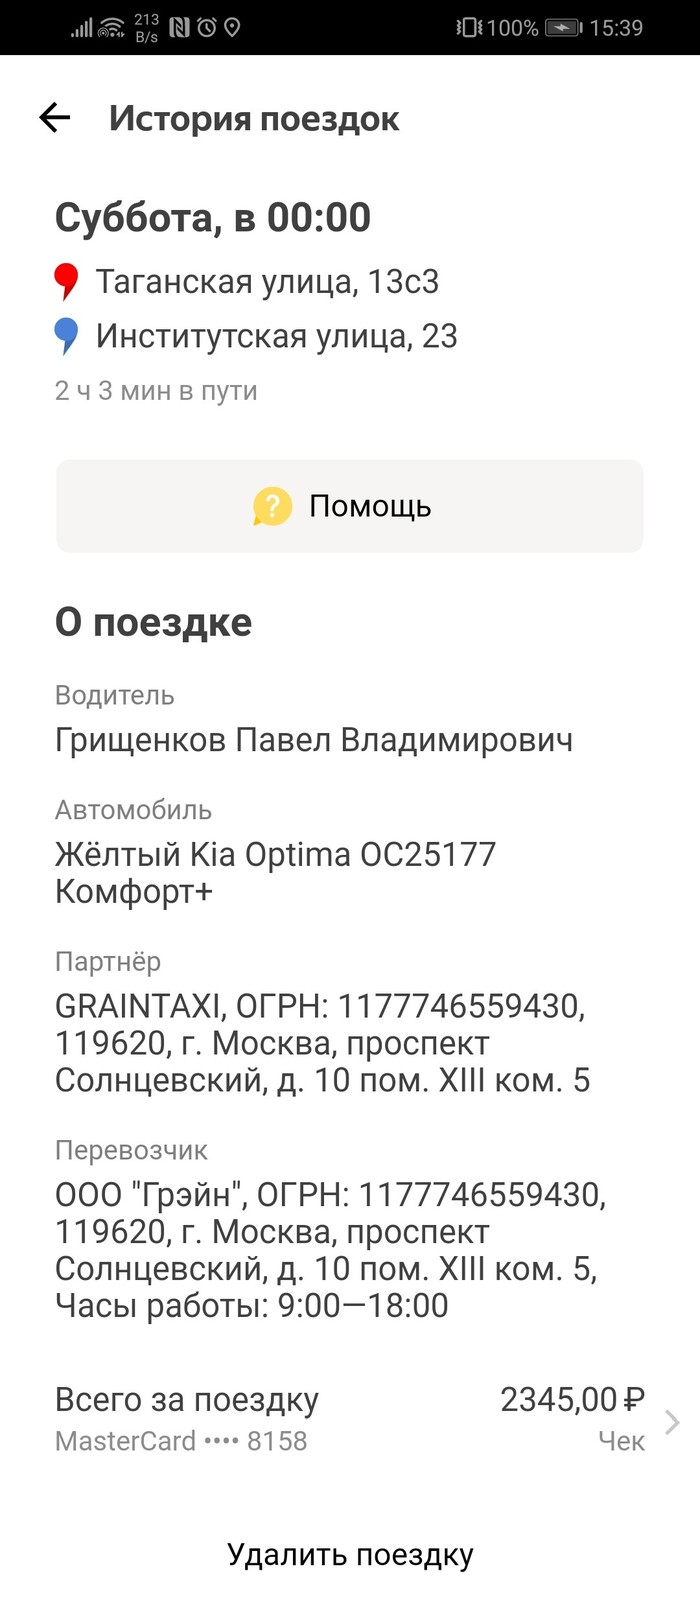 Поездка на яндекс такси Яндекс, Такси, Длиннопост